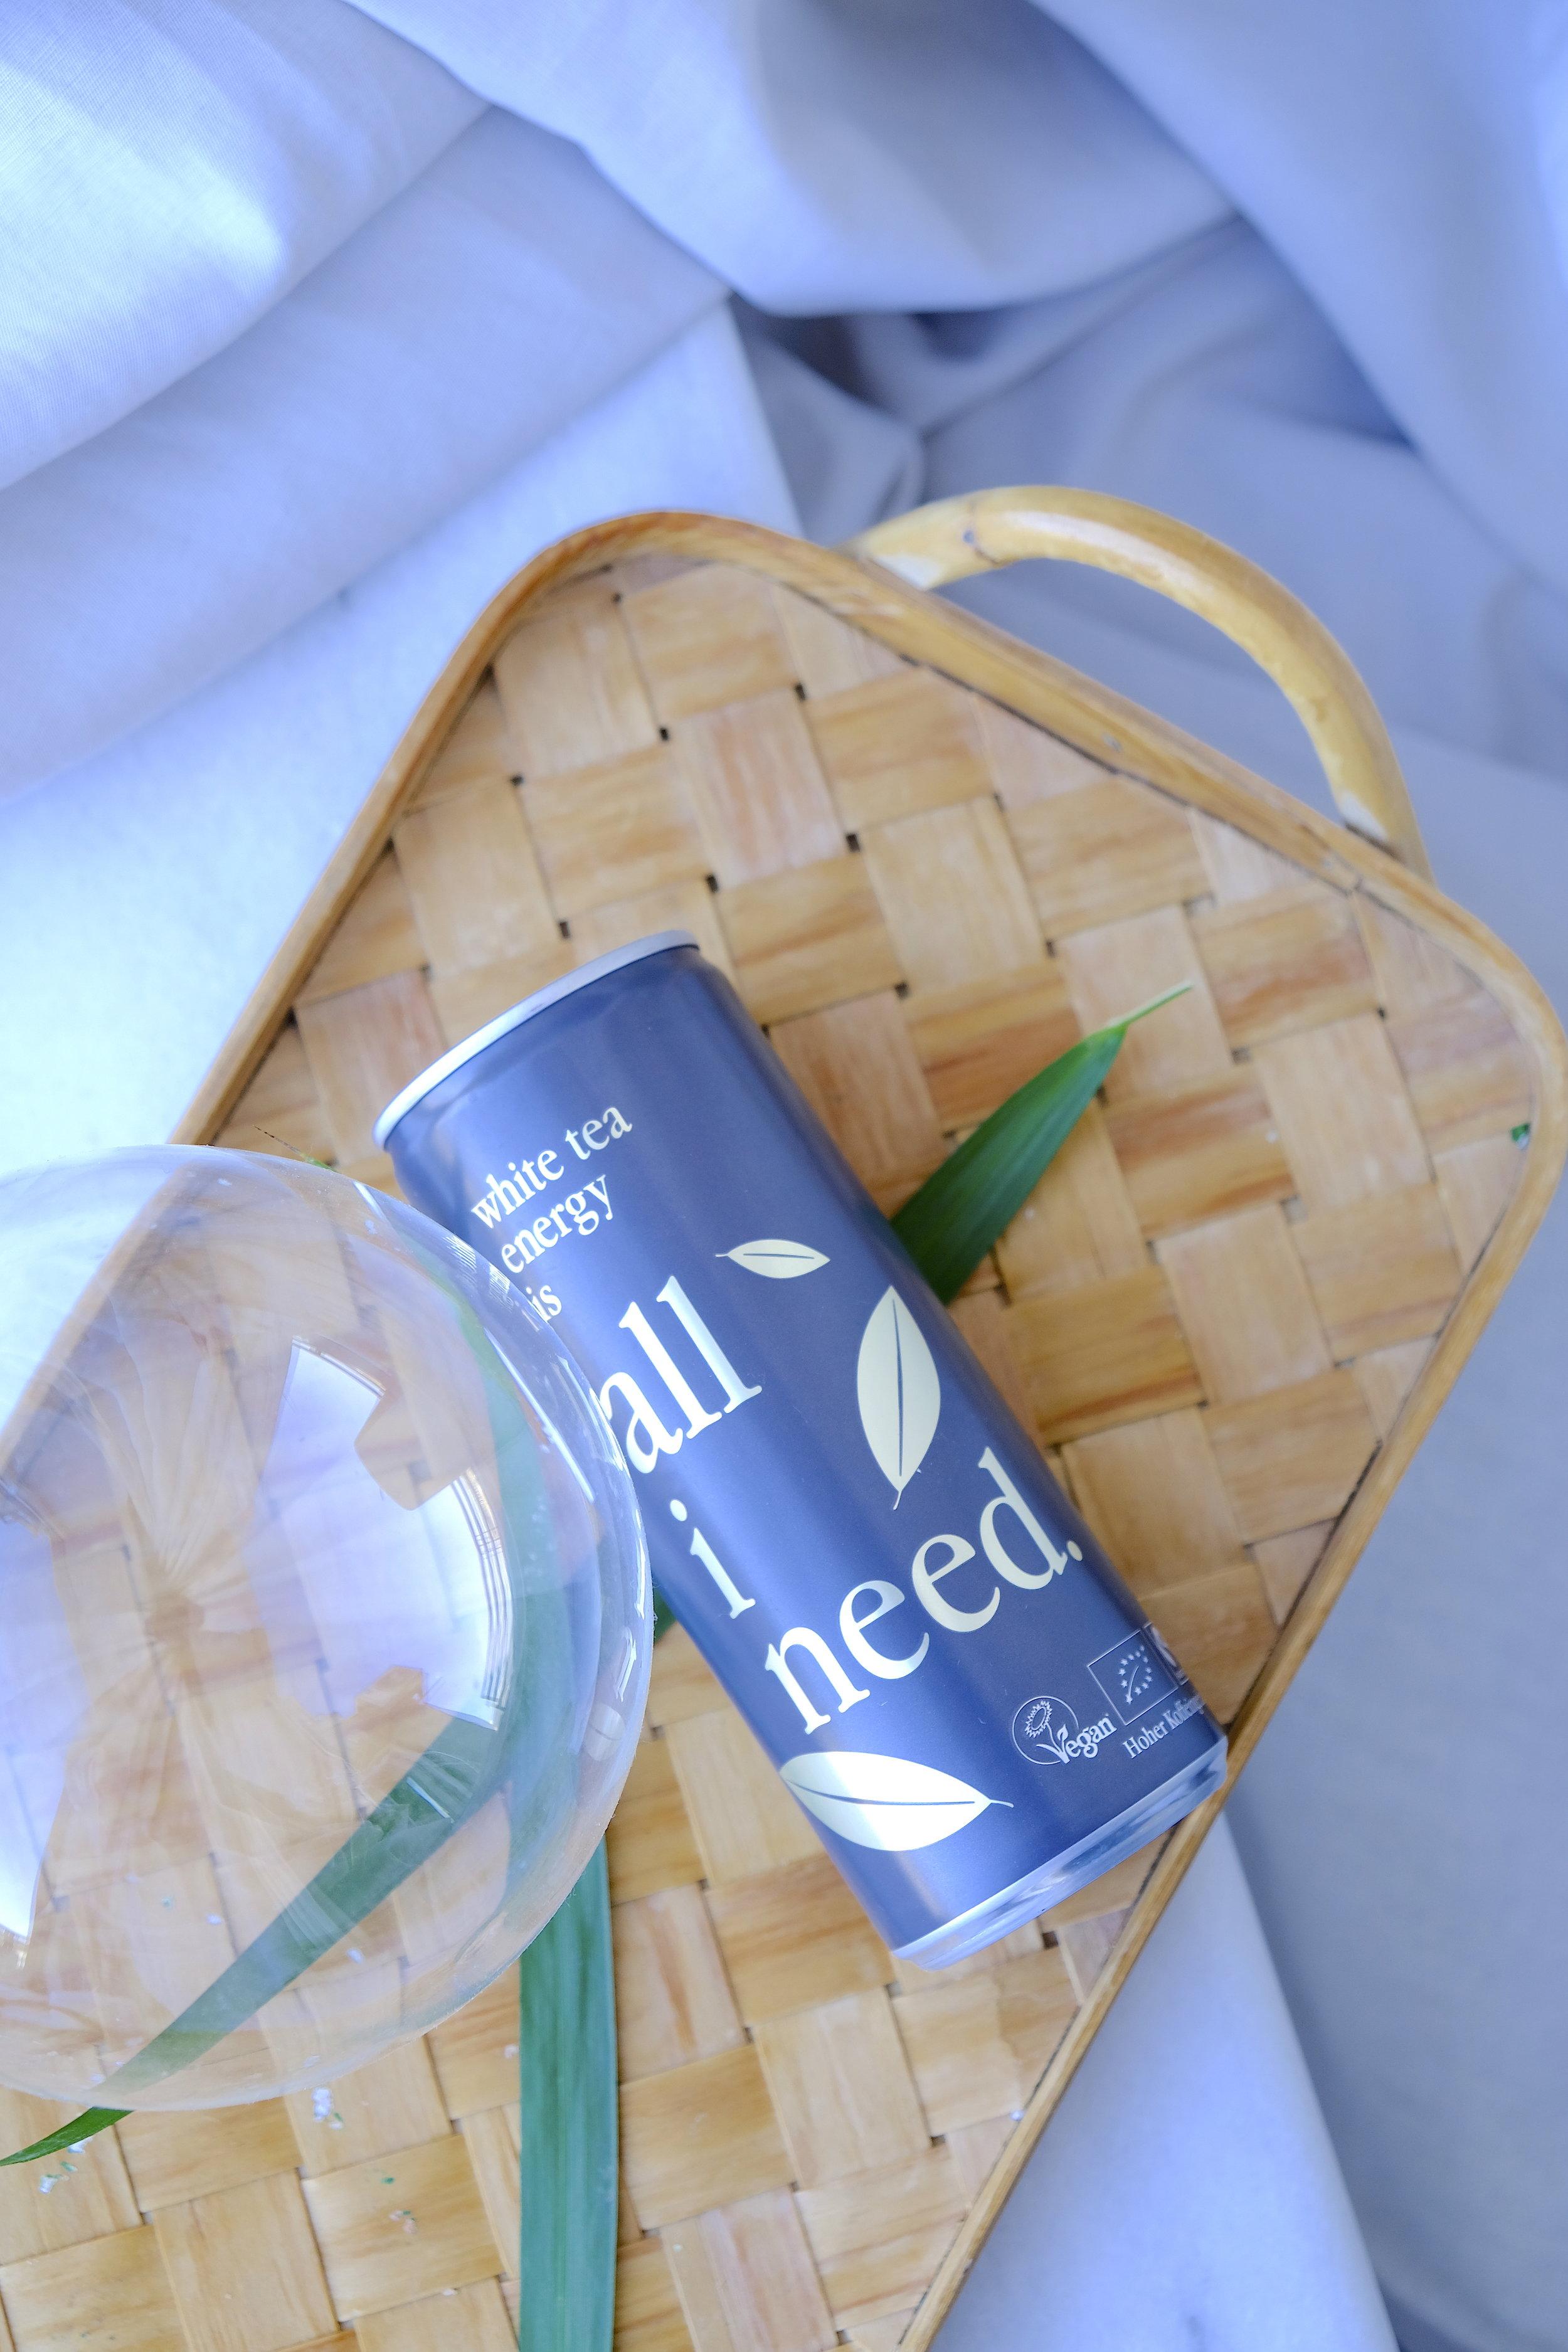 Dinner Stories_Cooperativa frufru_All I Need white tea_Mia Munteanu.JPG